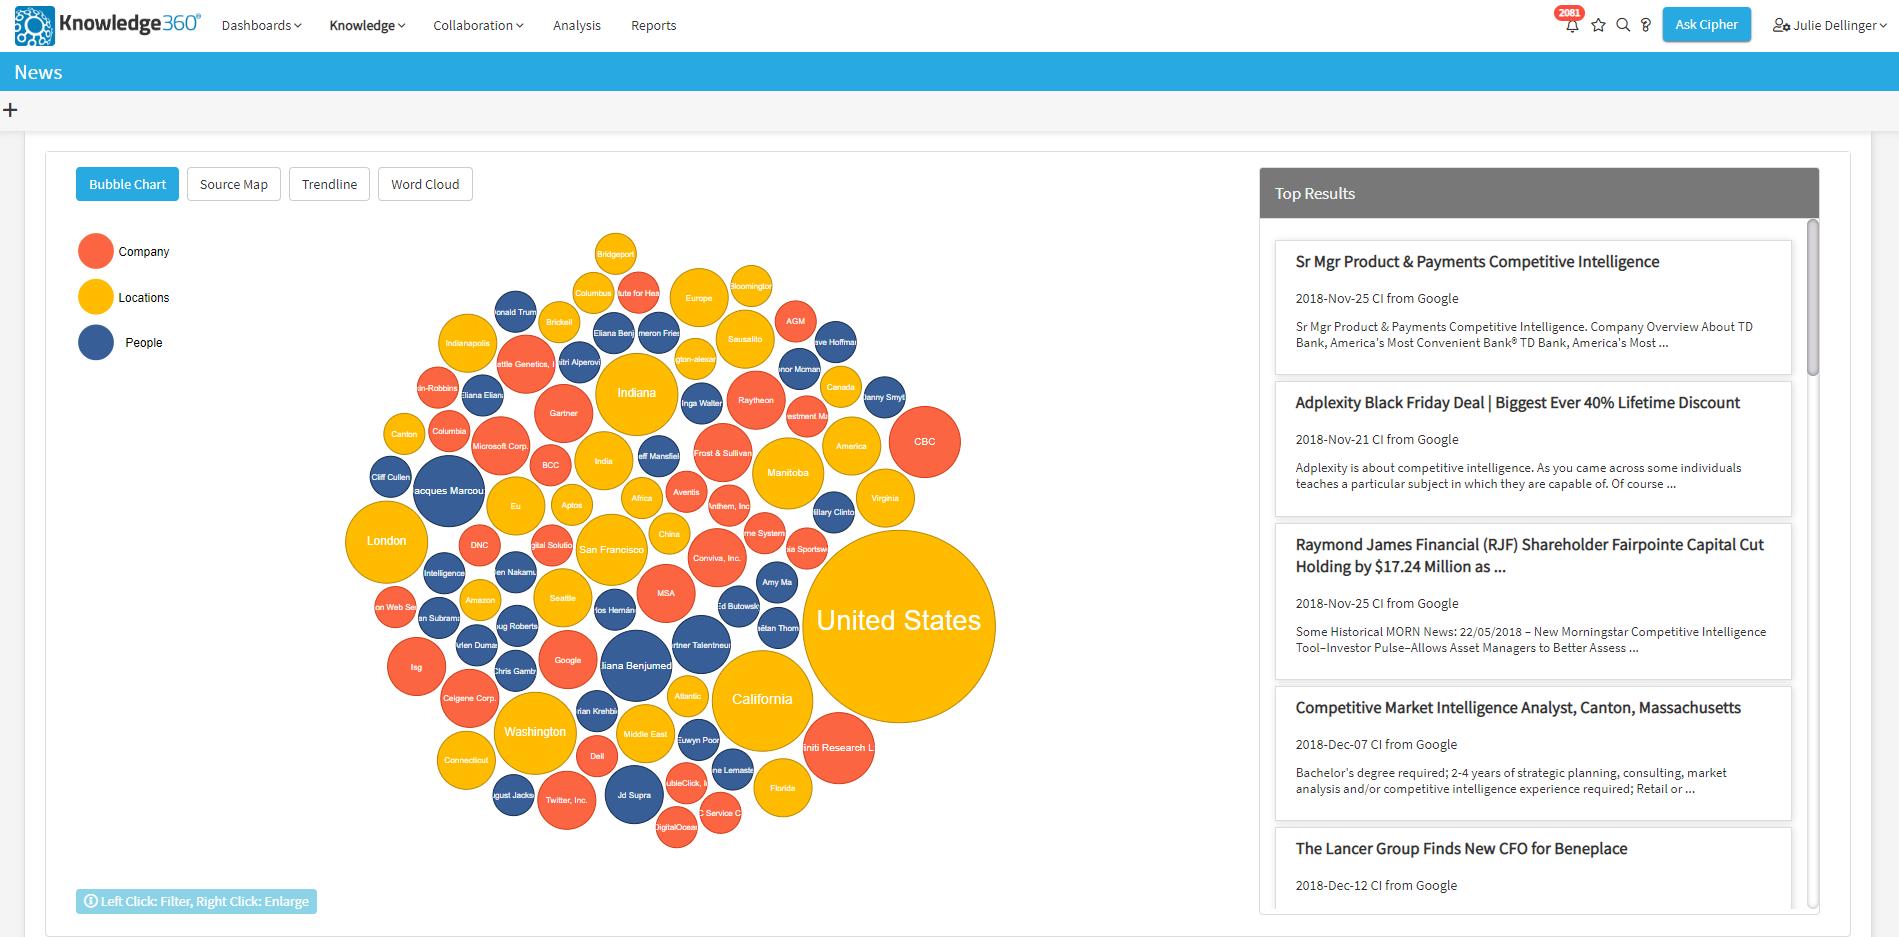 Knowledge360 News Visualizer